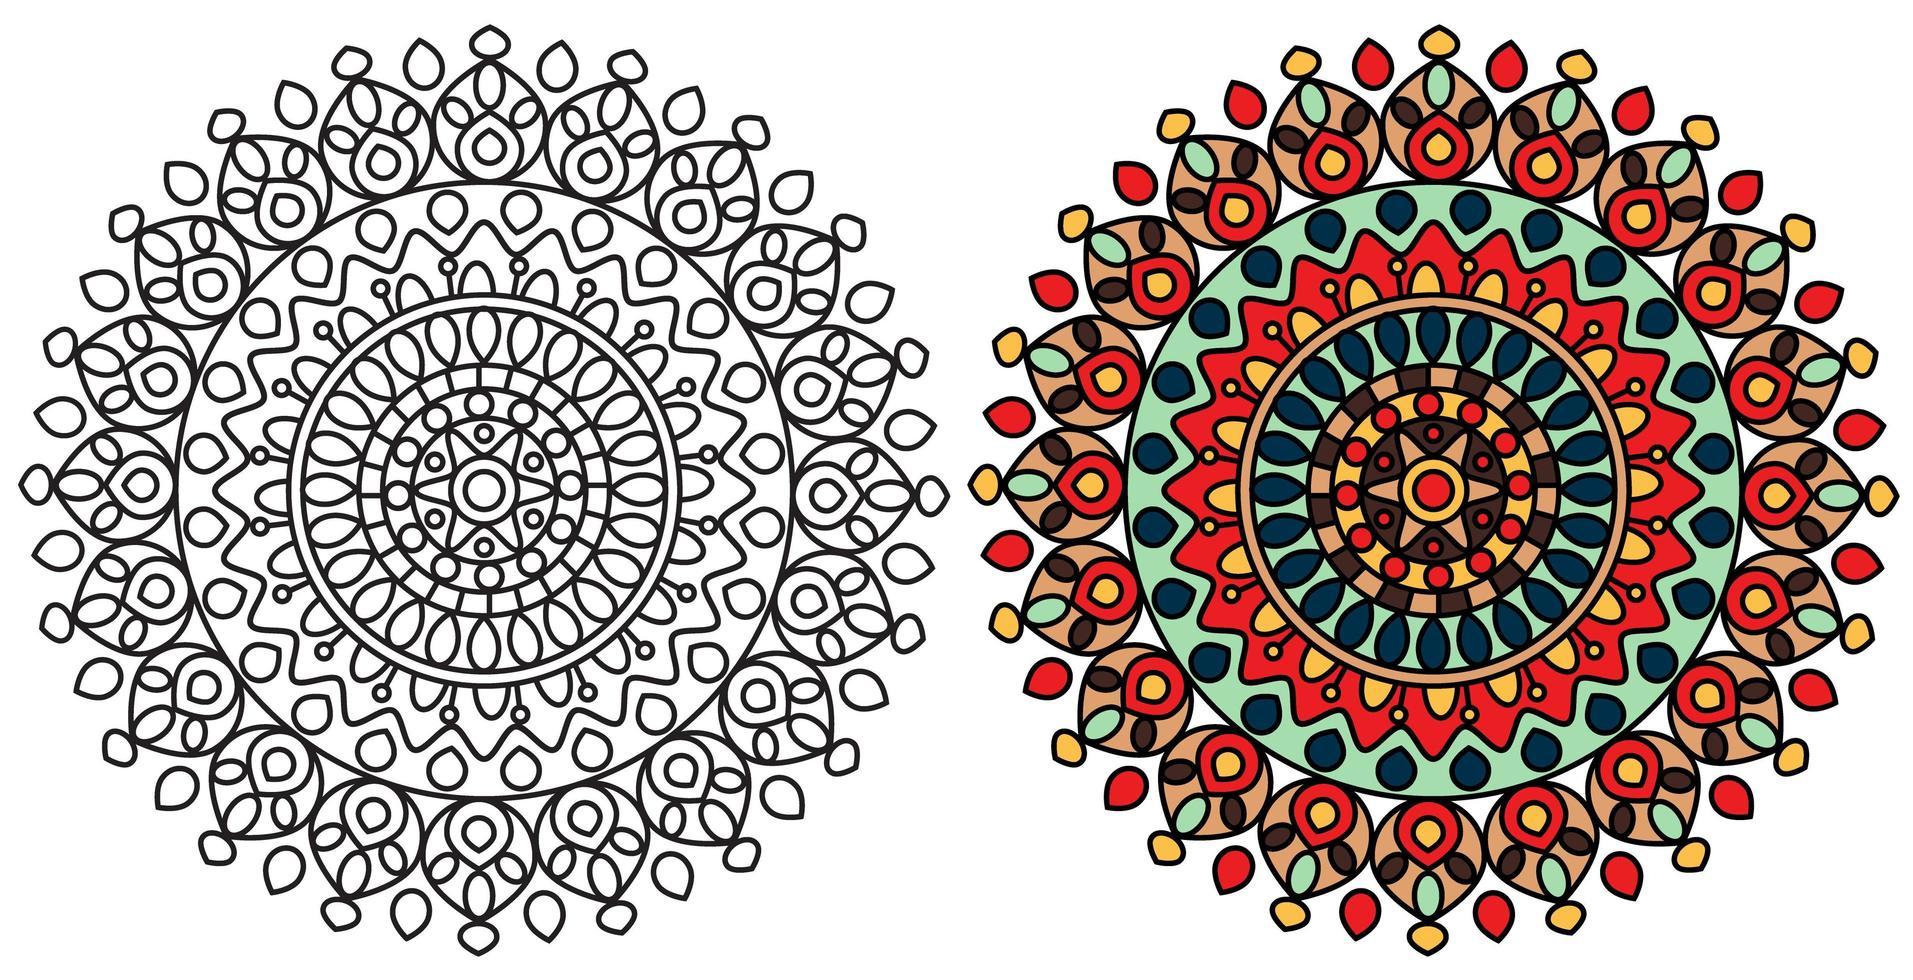 modelo de página para colorir colorido de mandala vetor